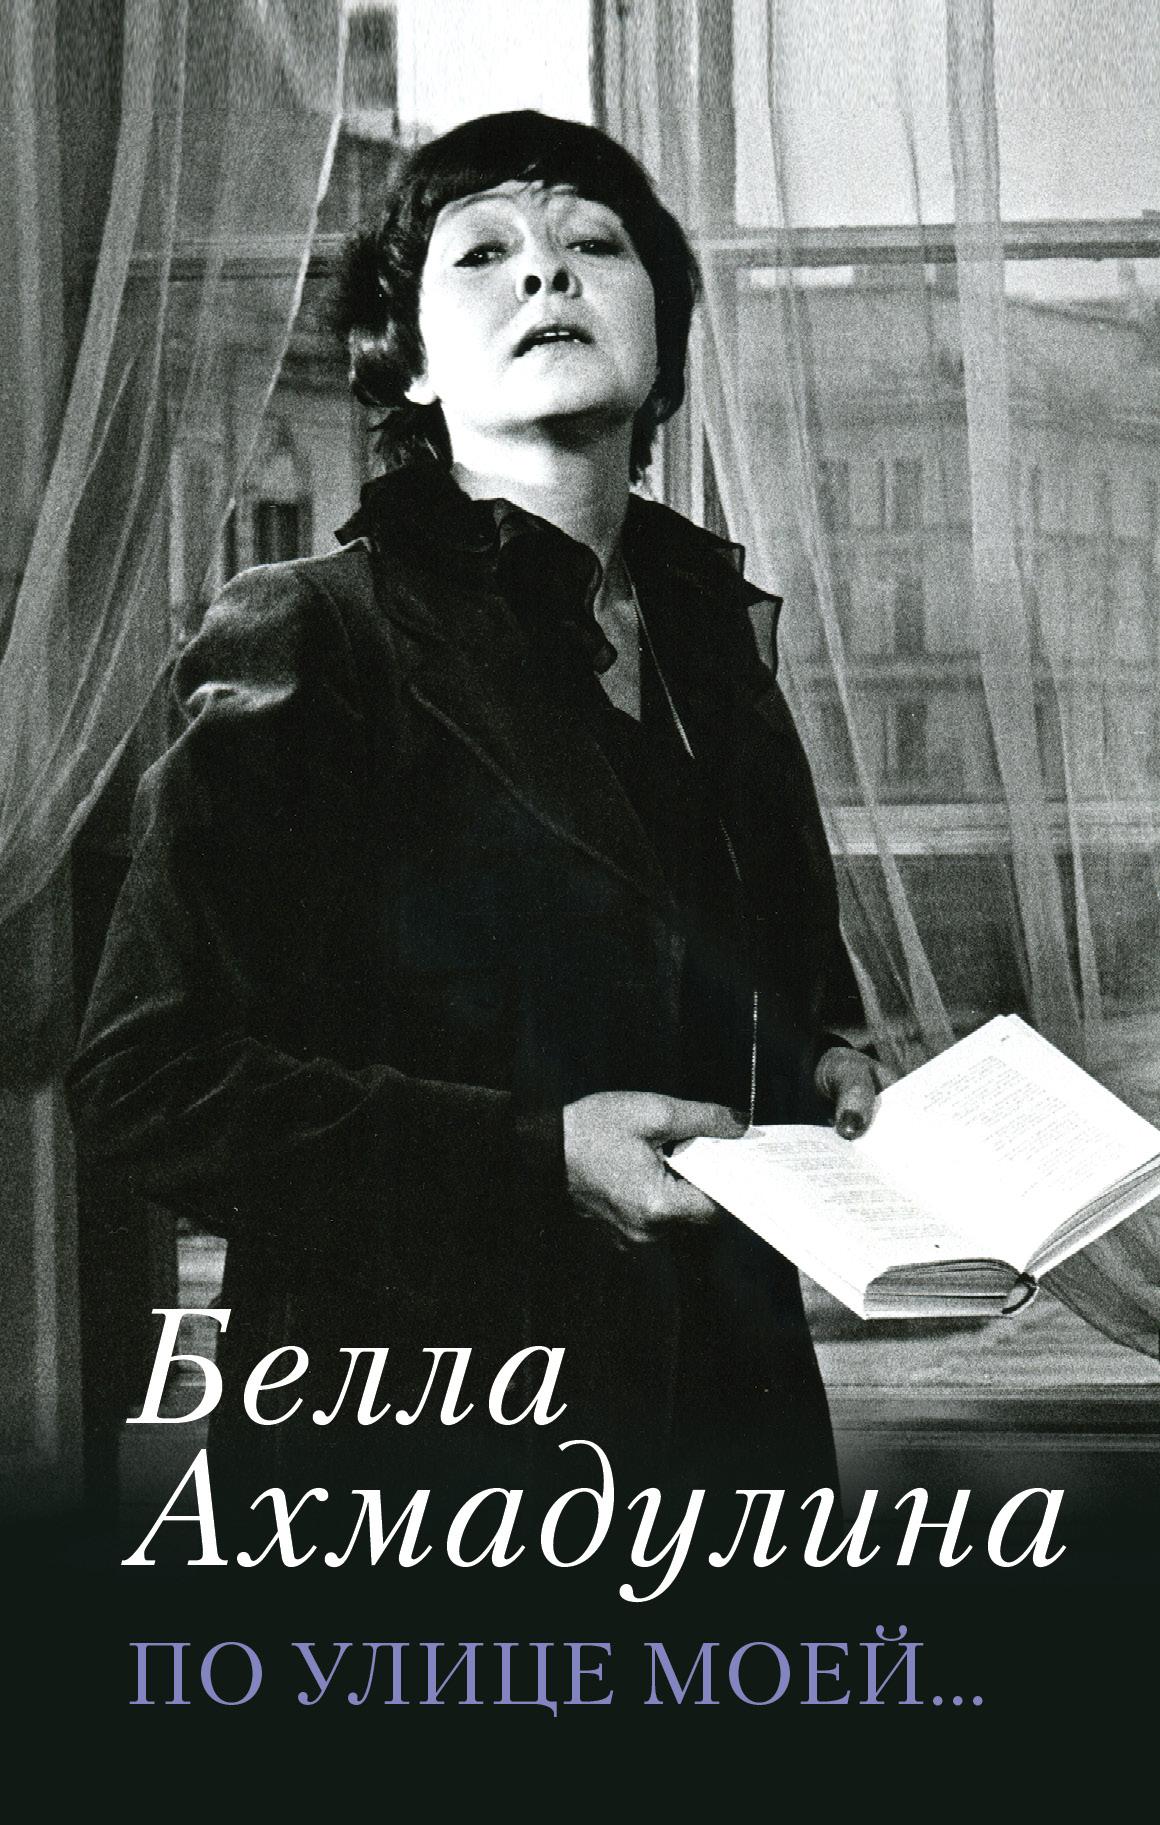 Ахмадулина Белла Ахатовна По улице моей... белла ахмадулина лирика